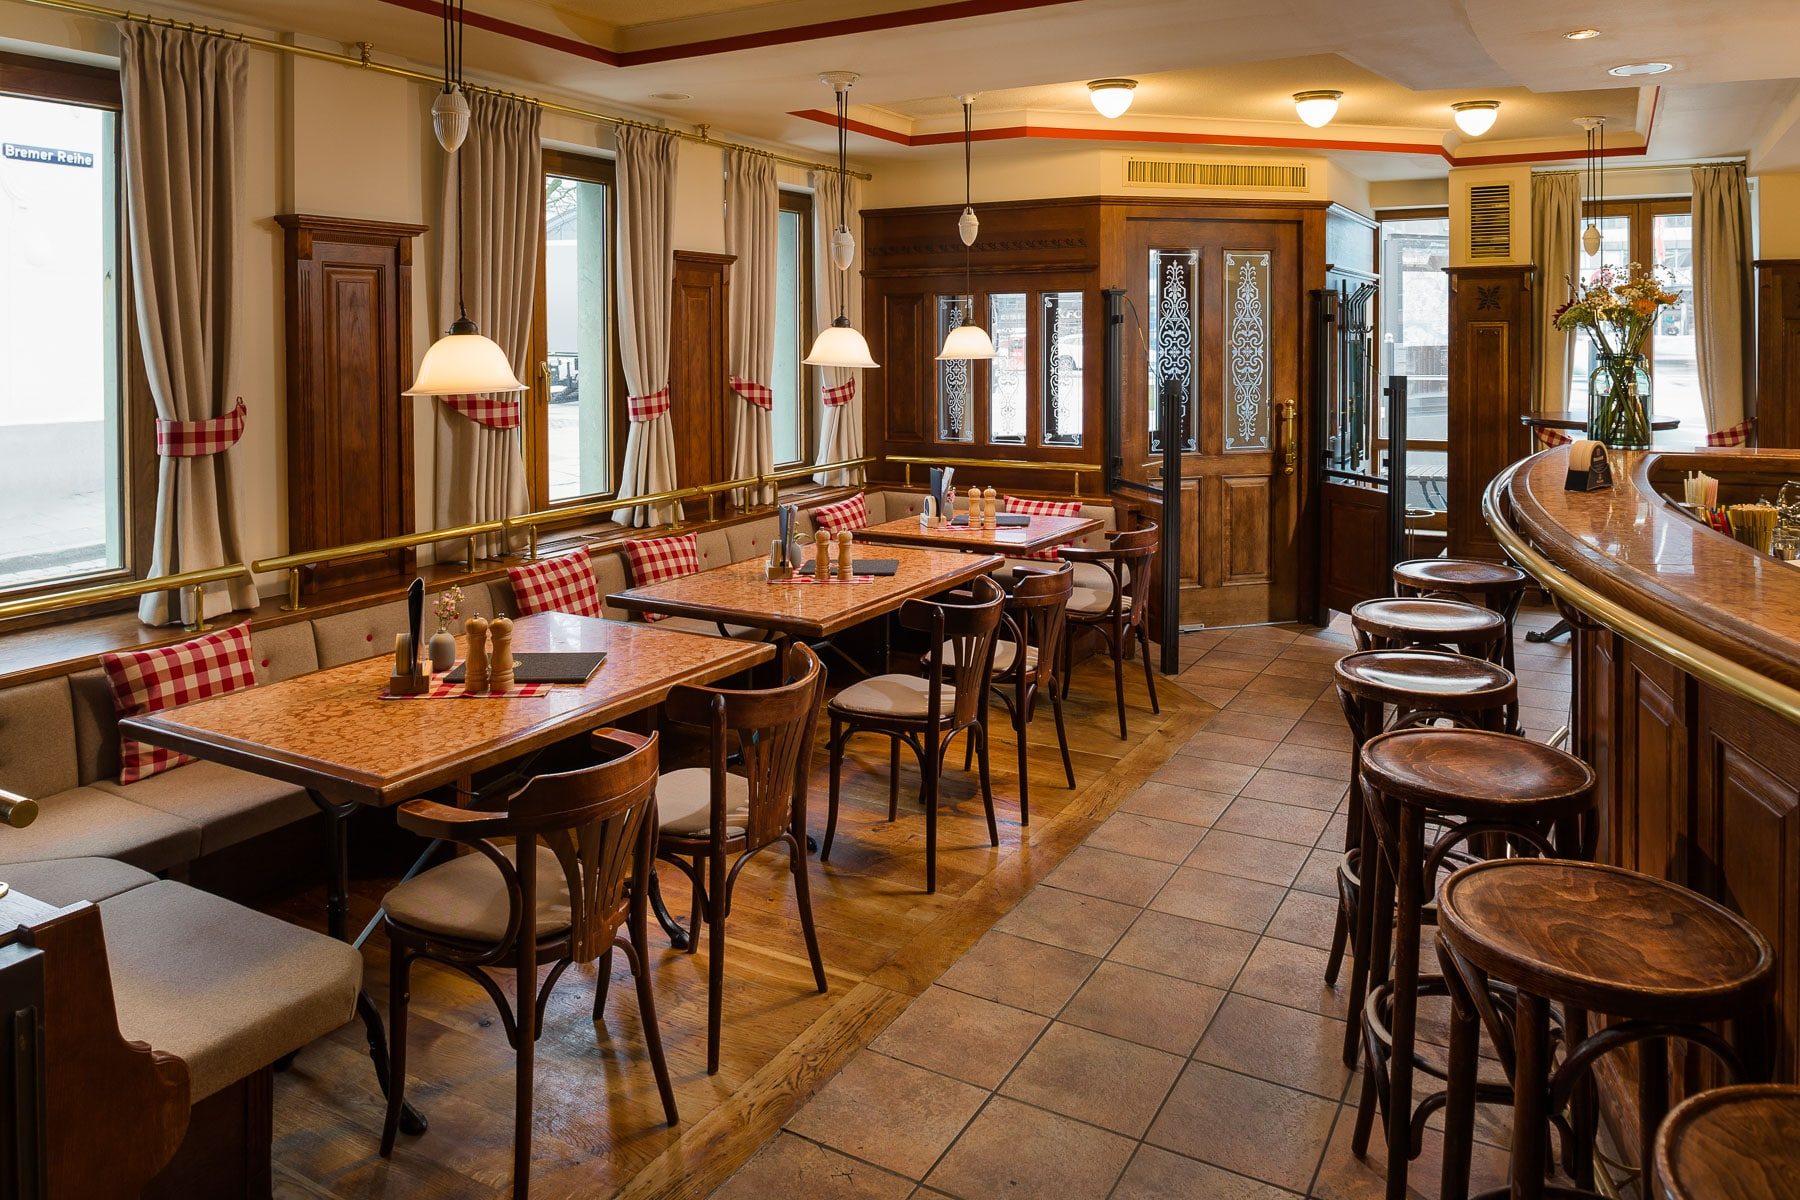 Restaurant Europäischer Hof